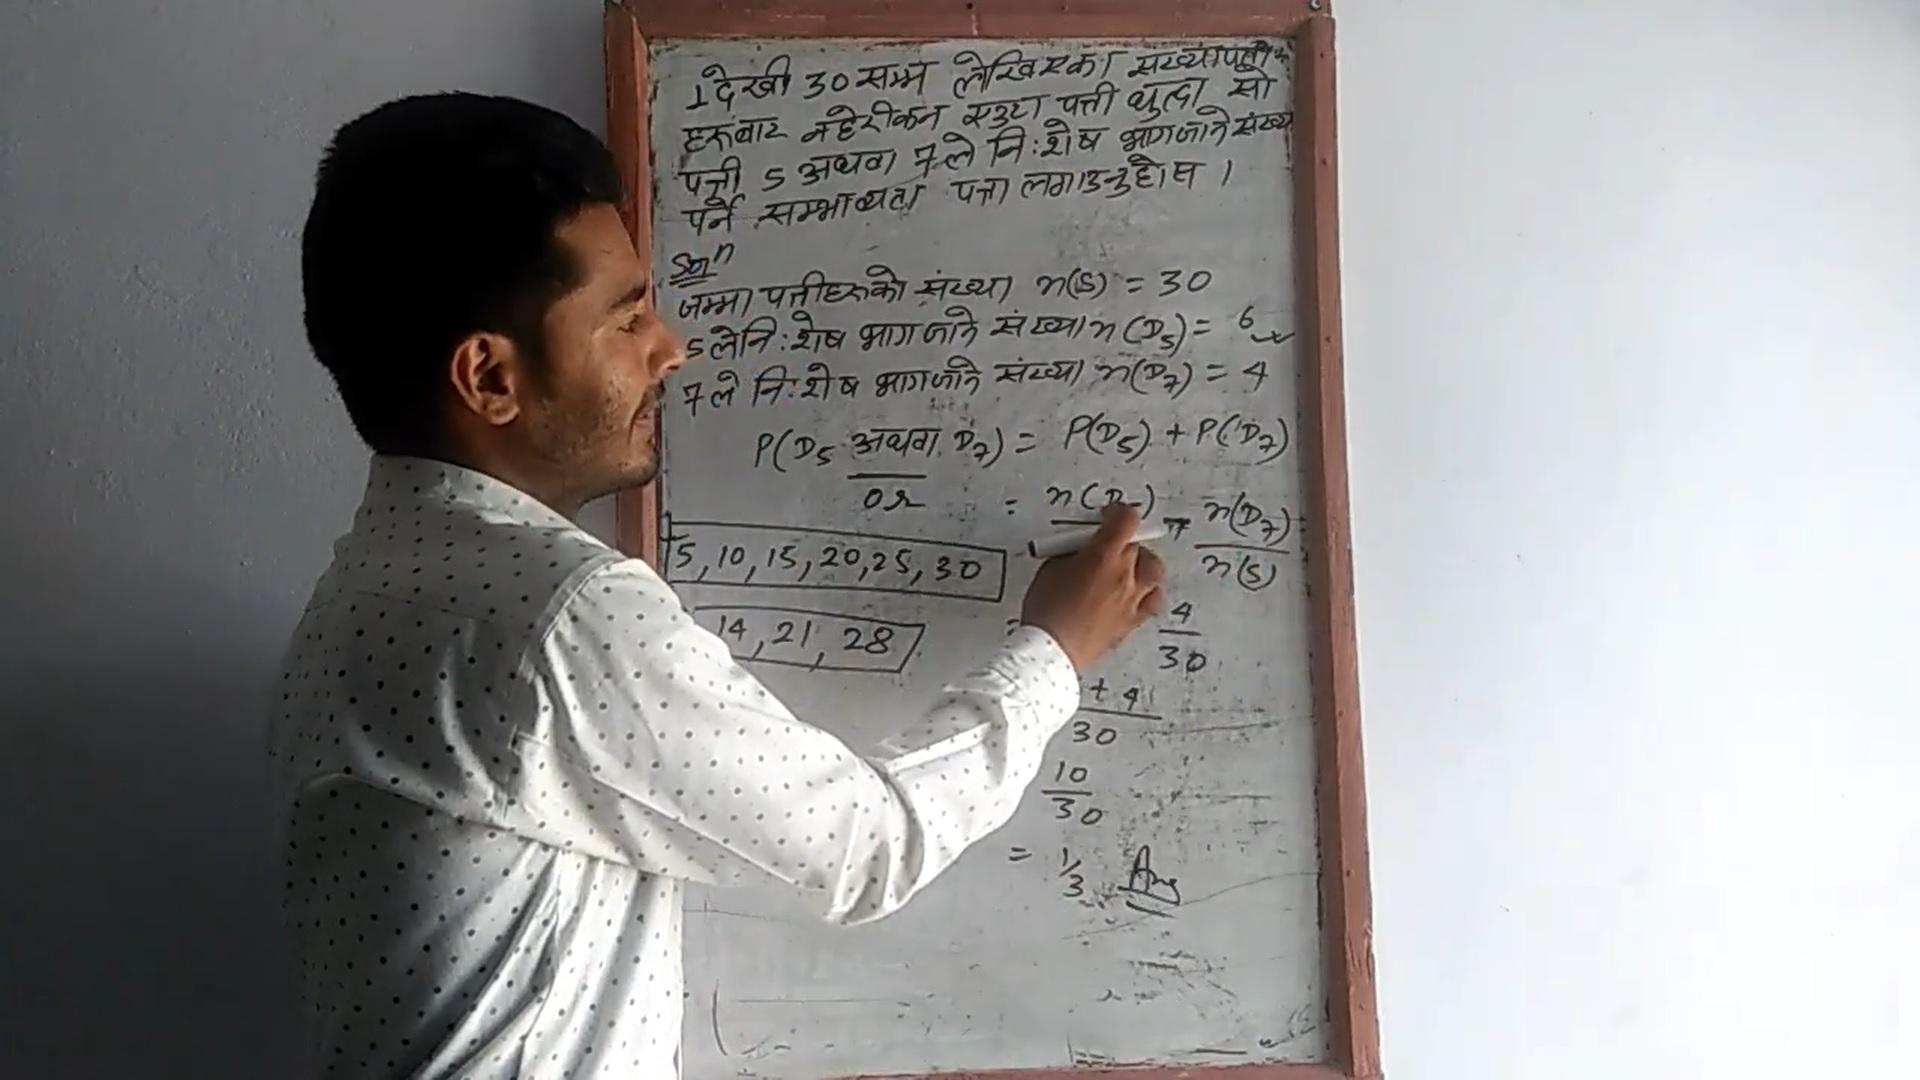 https://www.nepalbodh.com/others/science-technology/3416